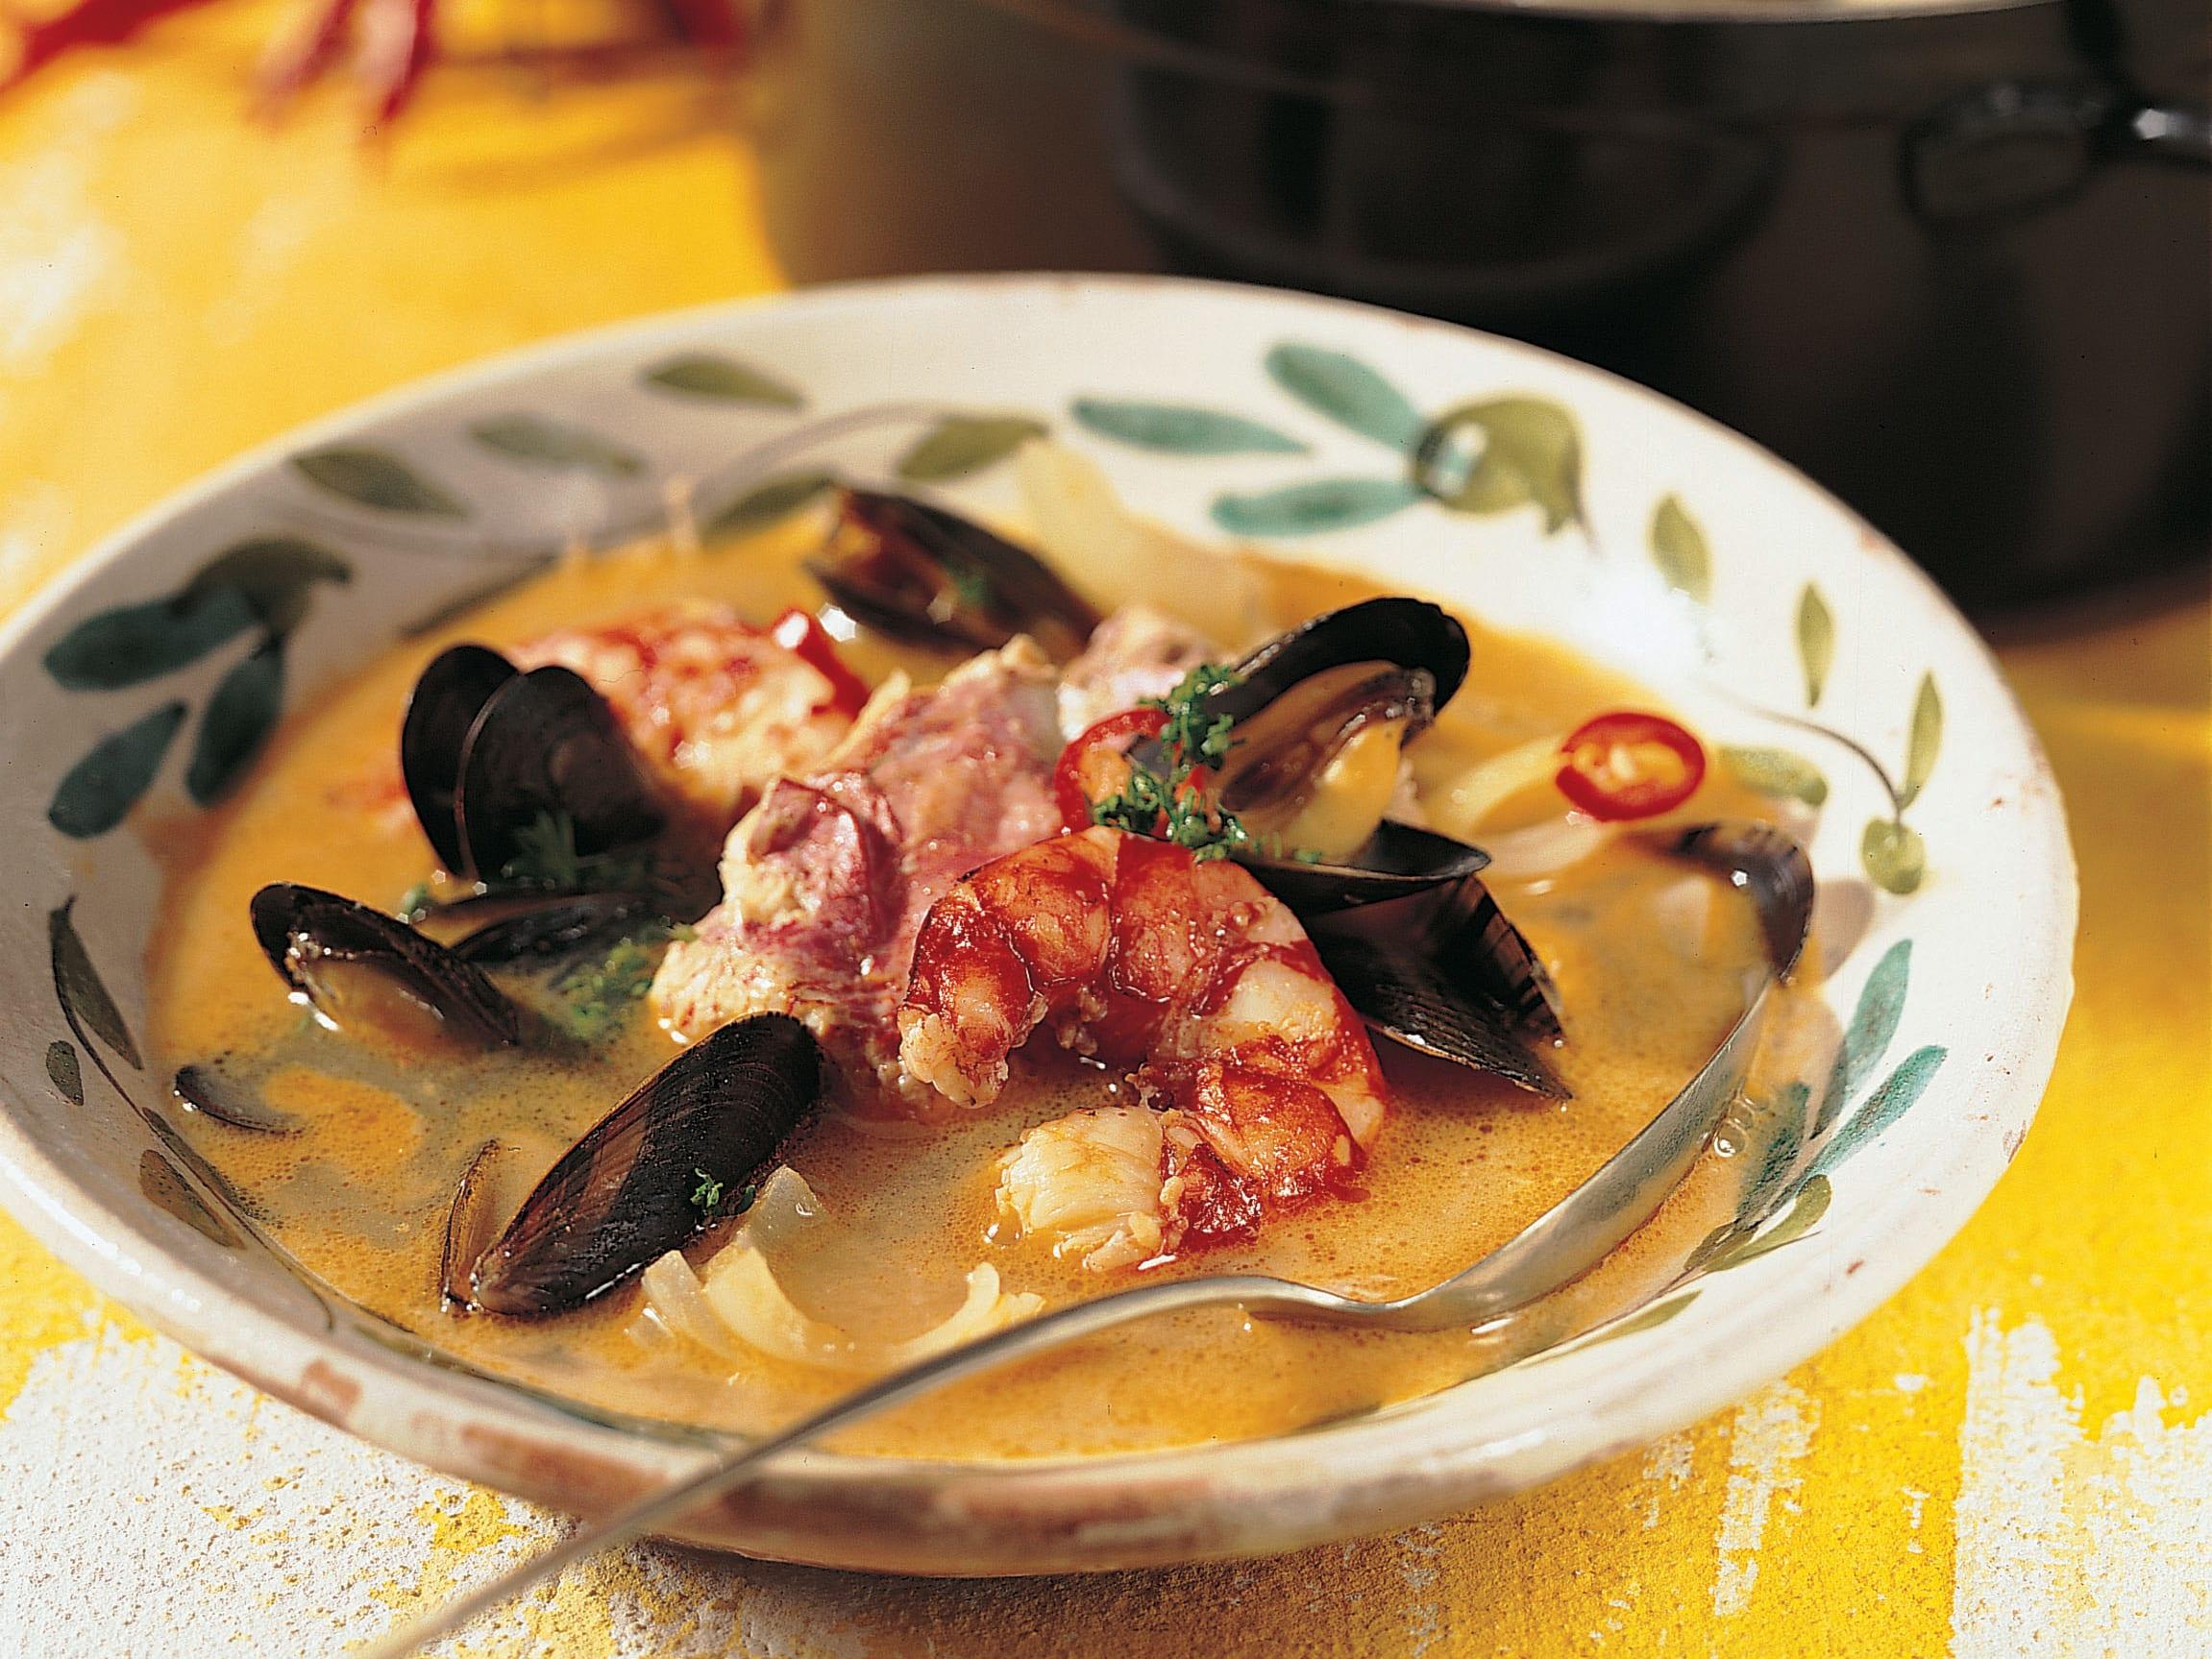 Fisch-Meerfrüchte-Eintopf (Caldeira de pescados y mariscos)